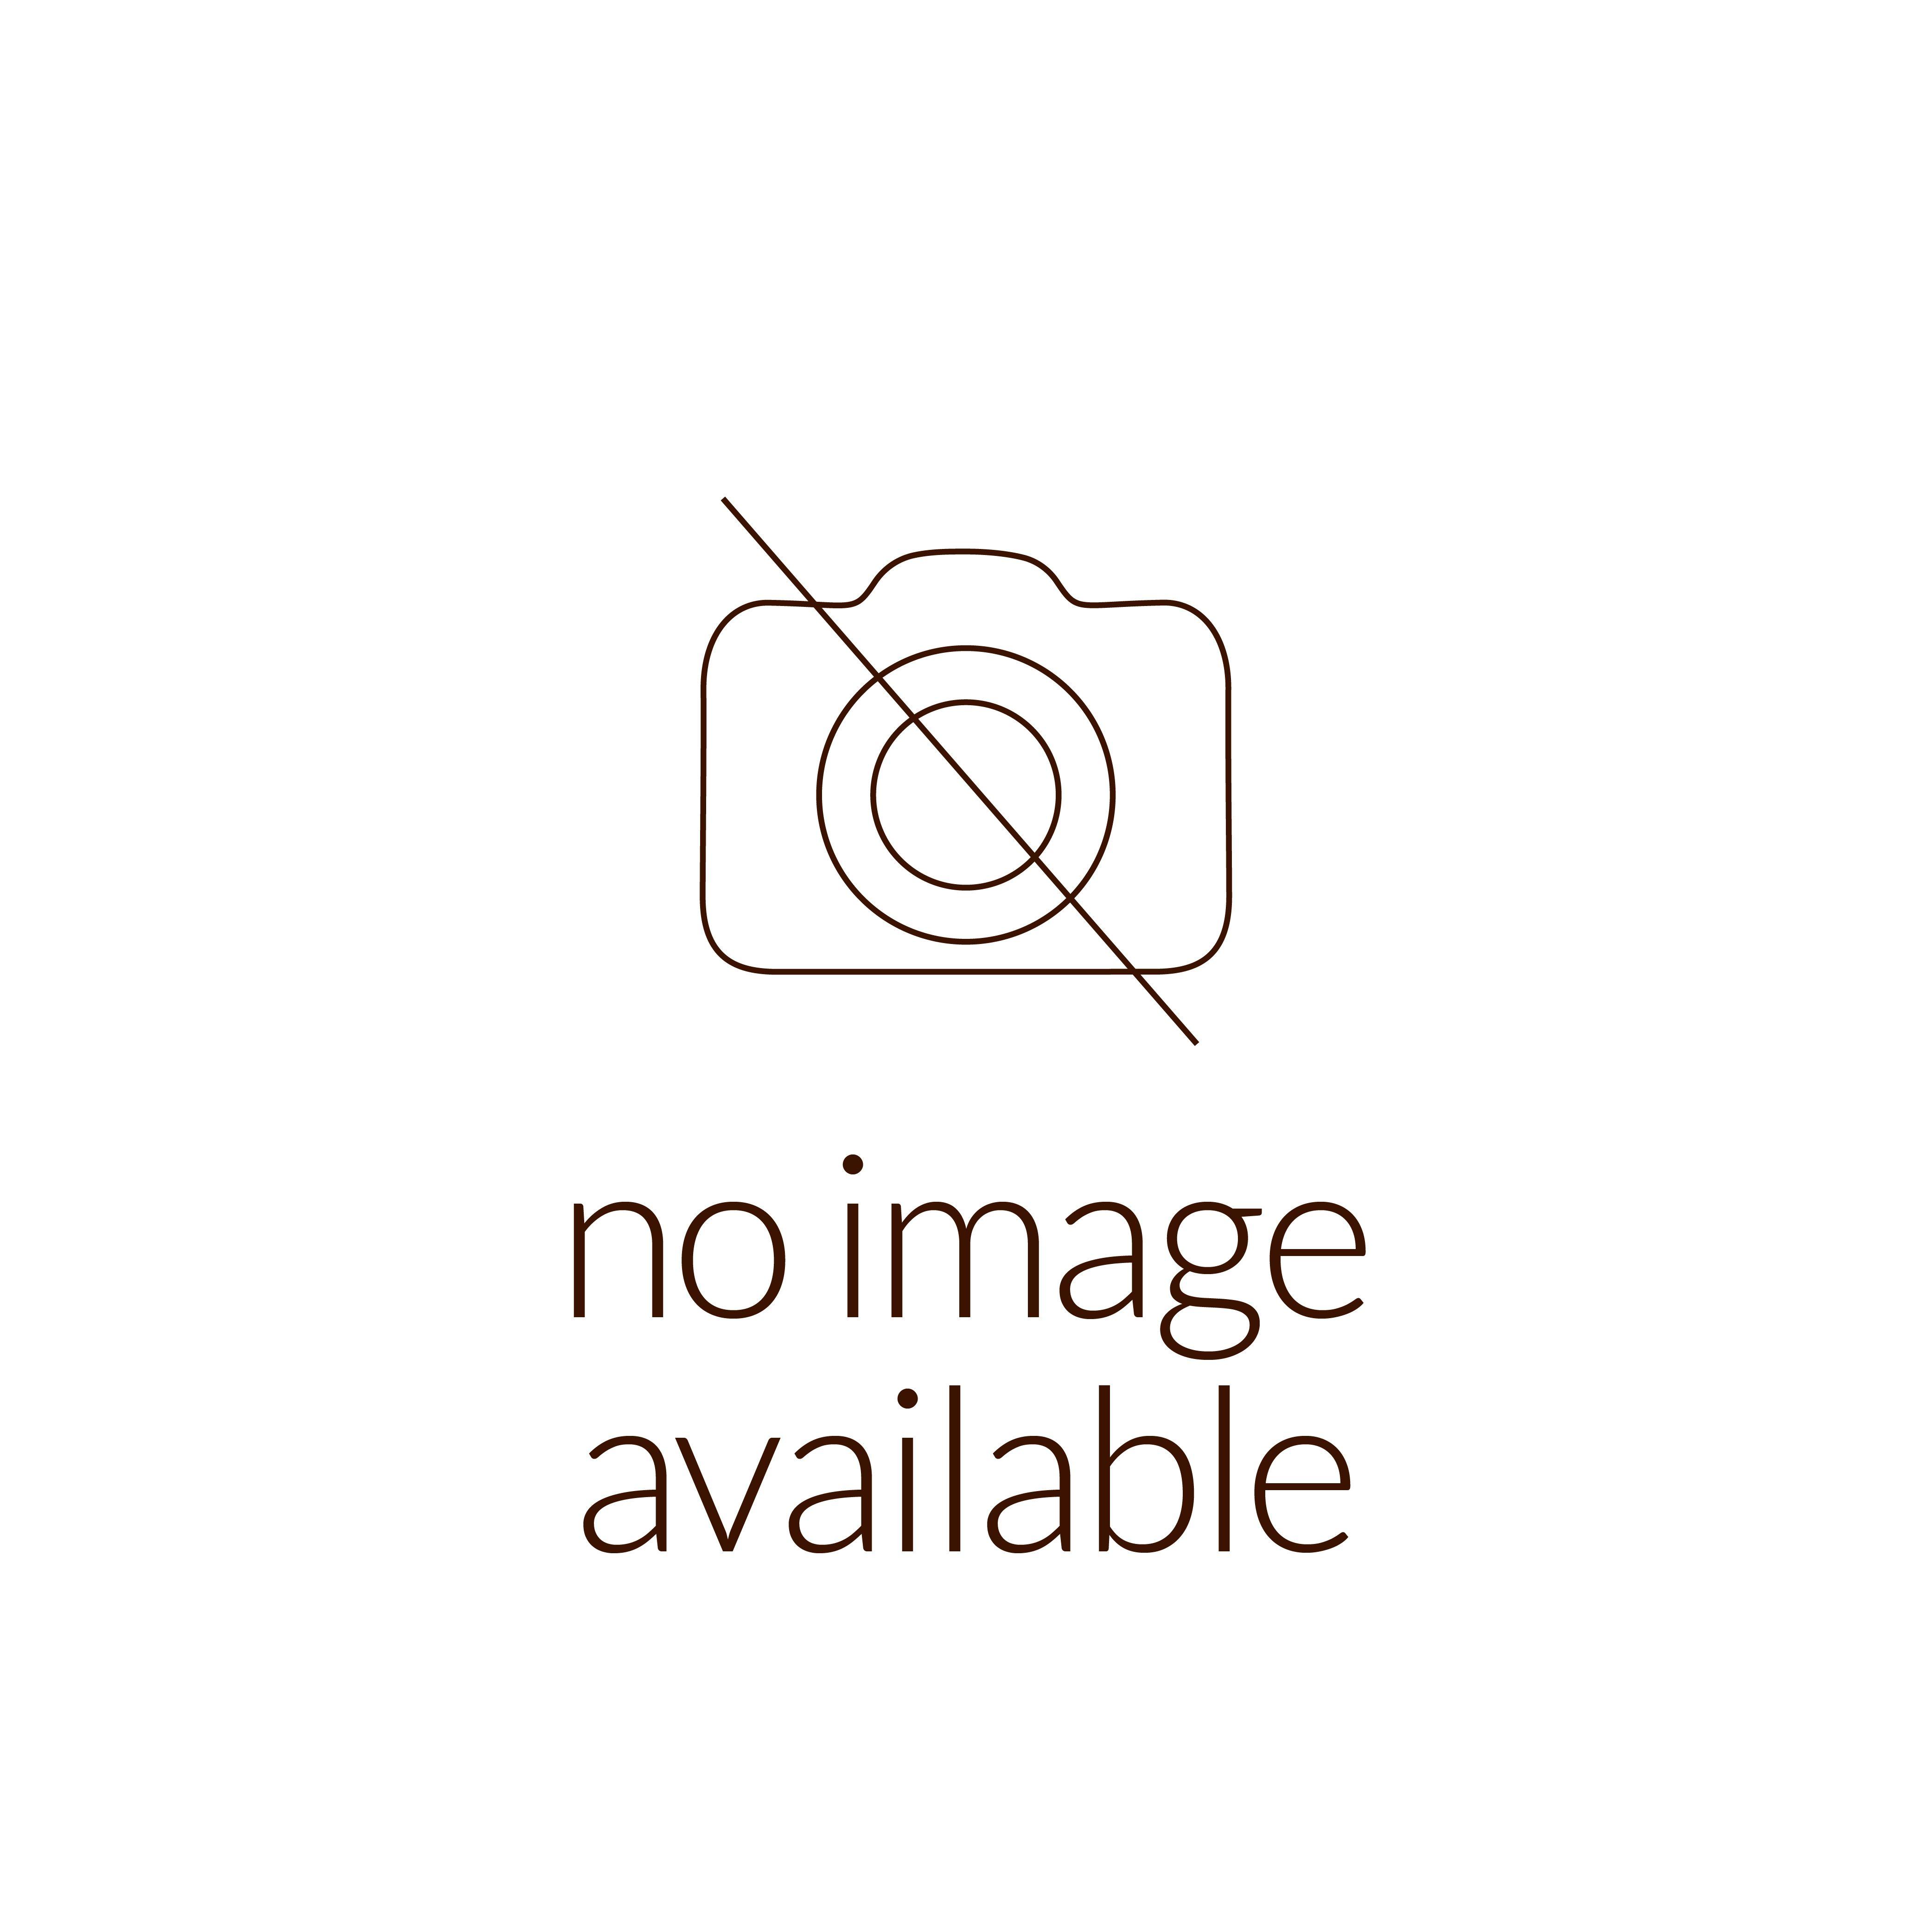 Chiune Sugihara - 50.0 mm, 60 g, Silver999